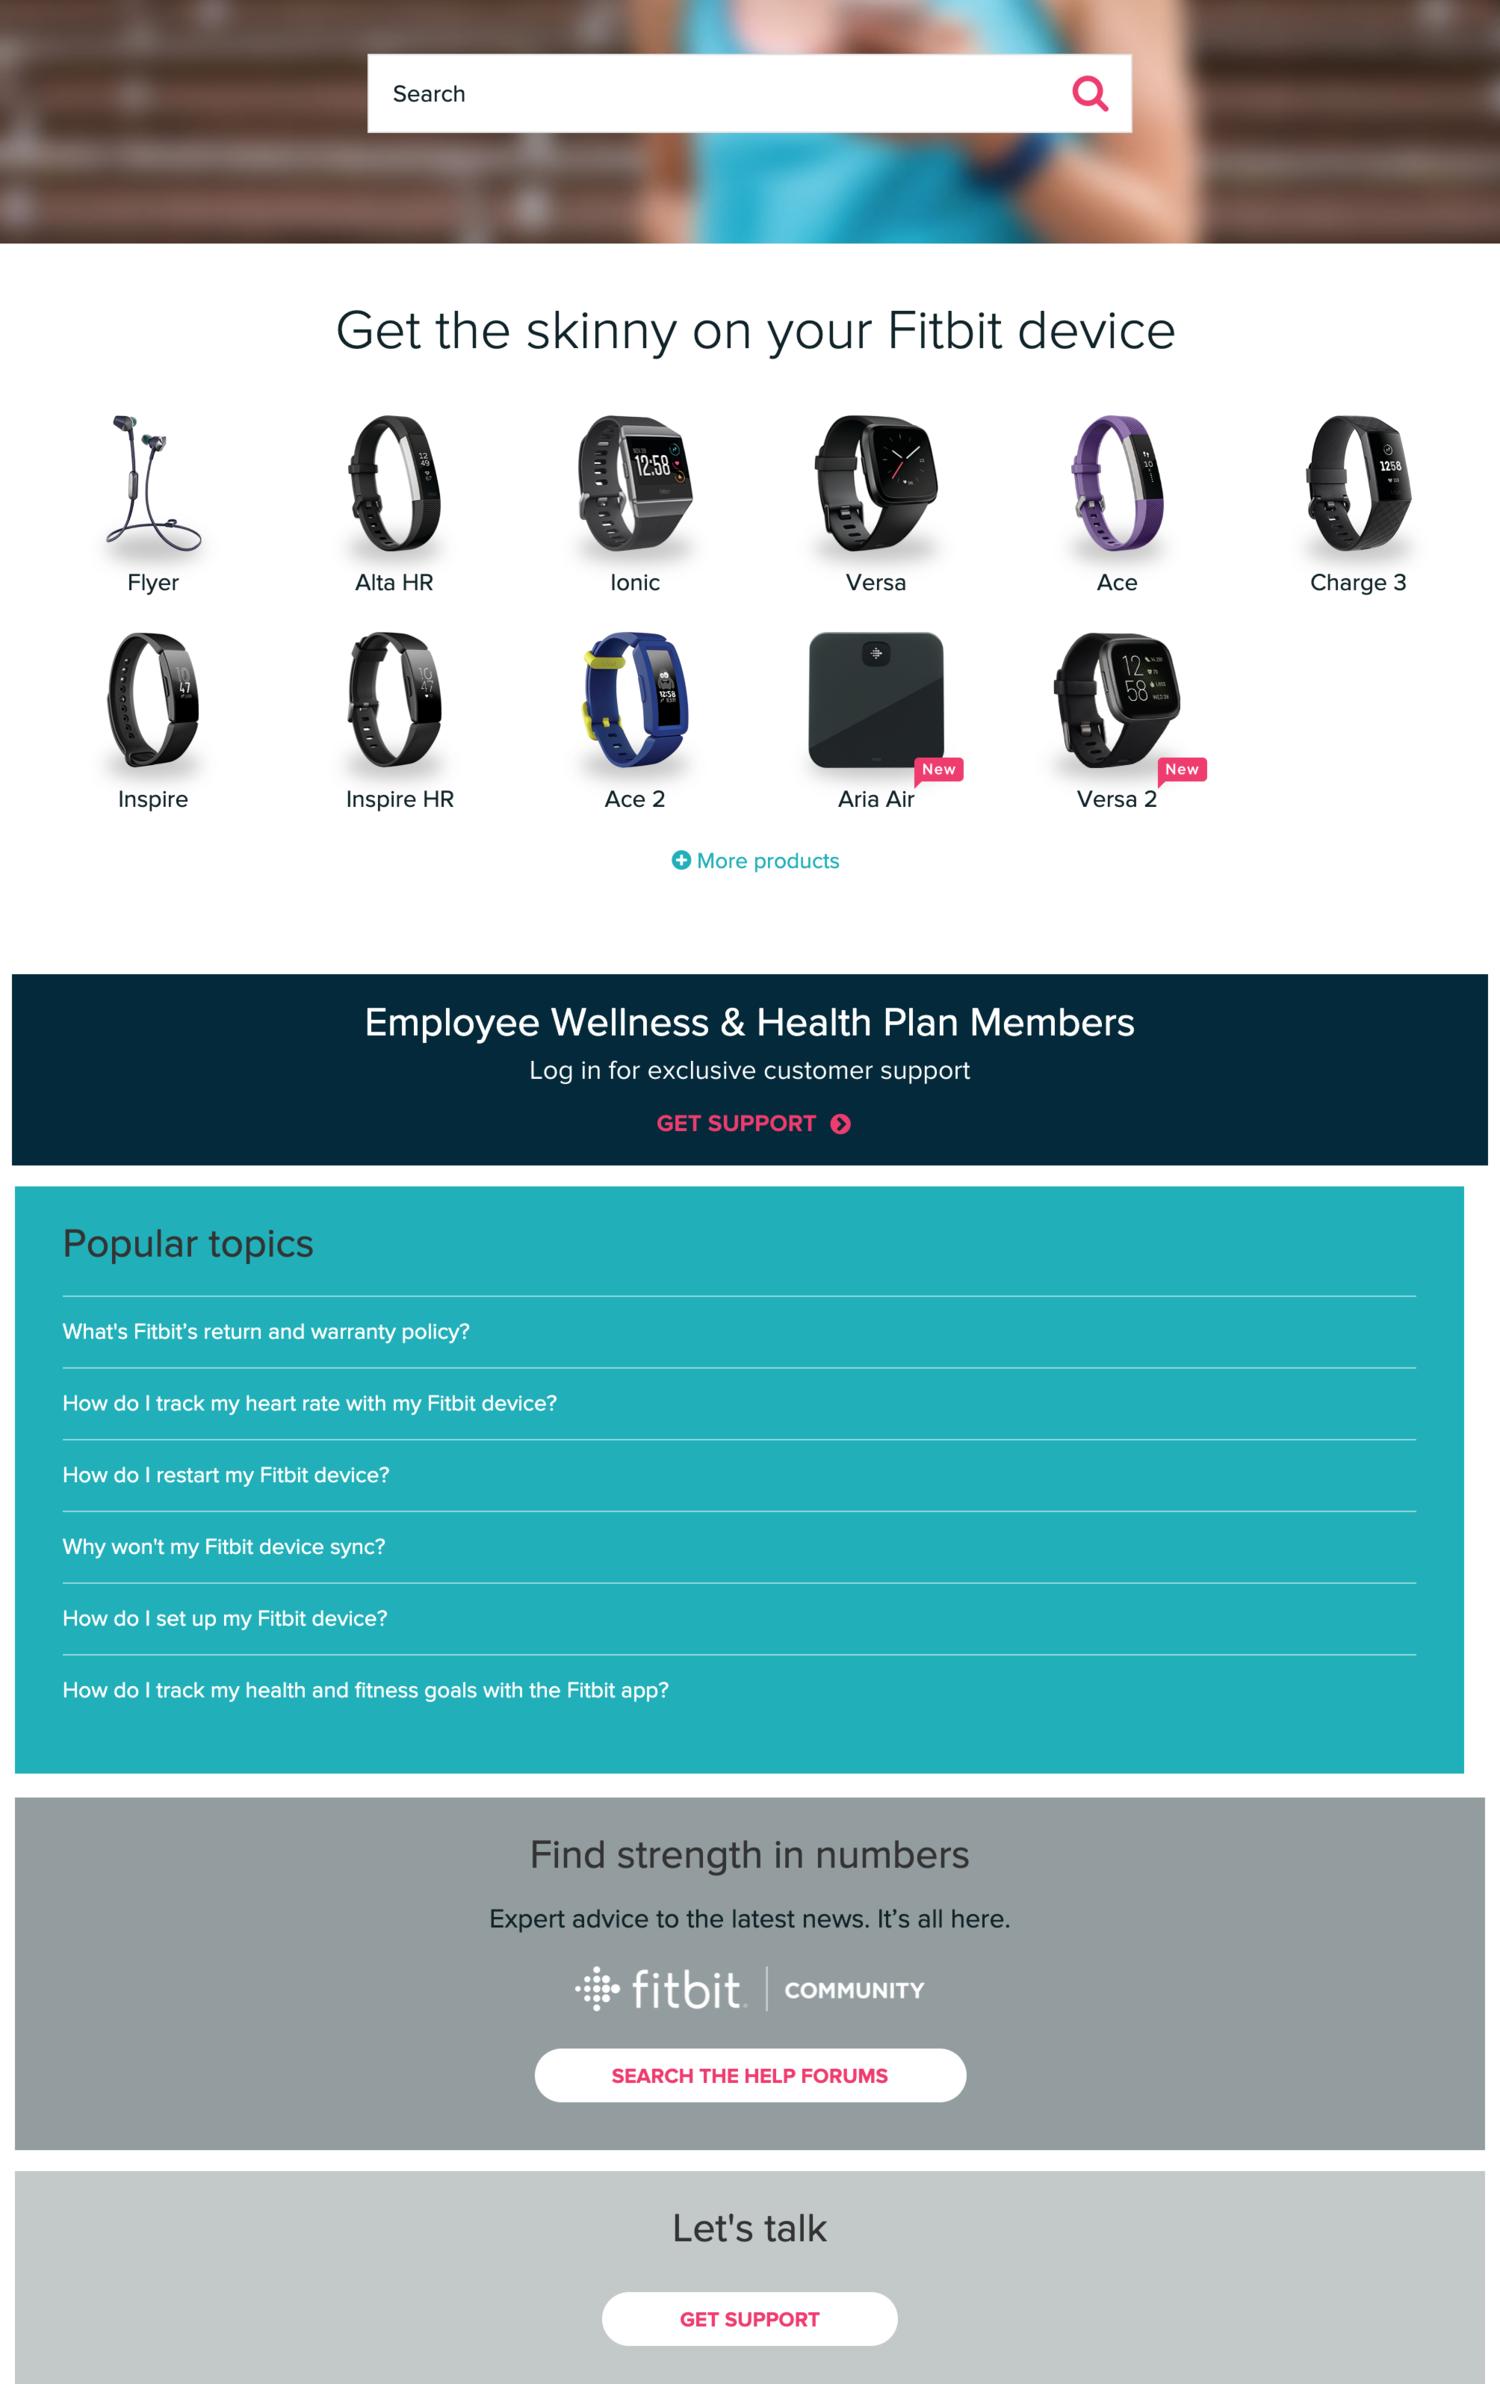 Fitbit brand help center